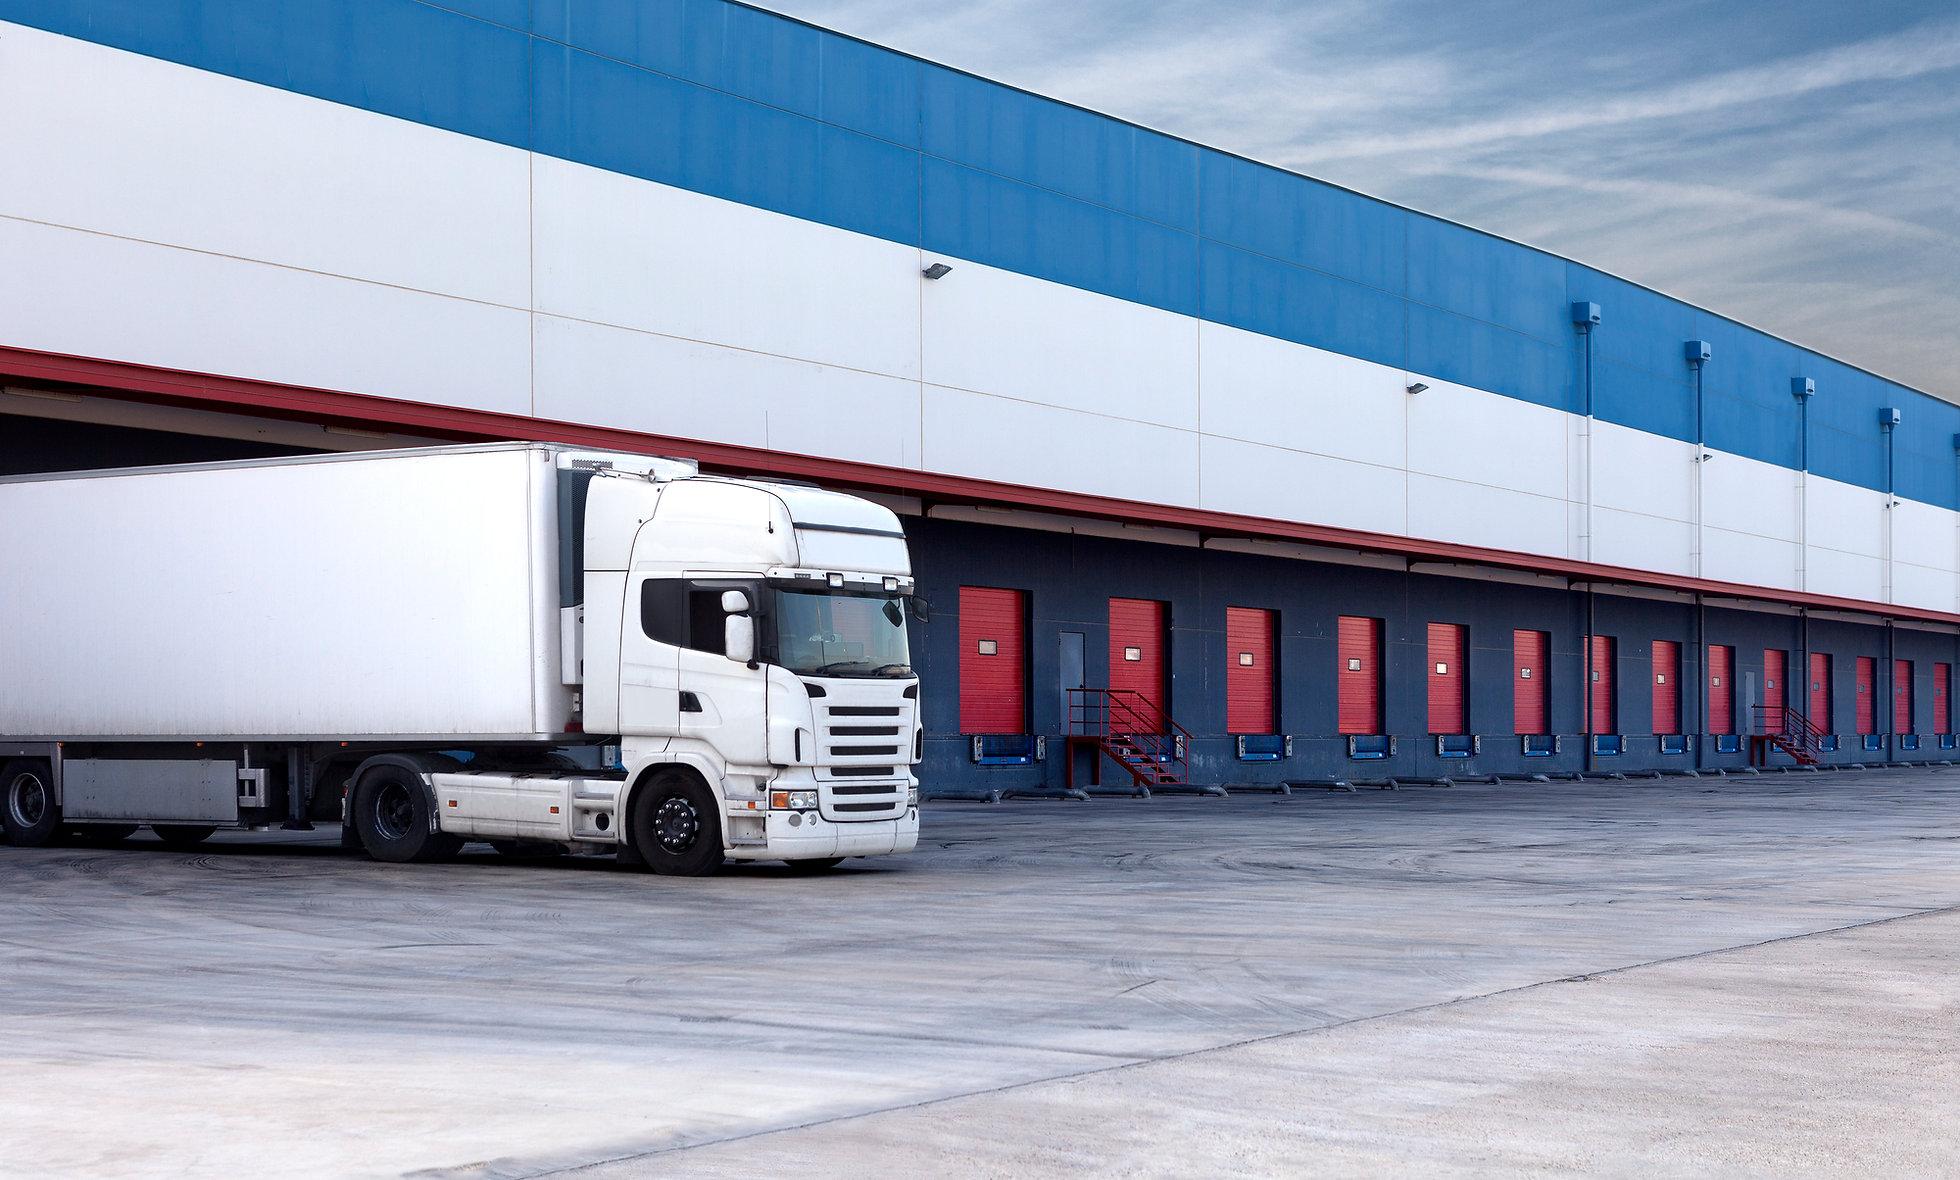 High Level Australian export business seeks partner